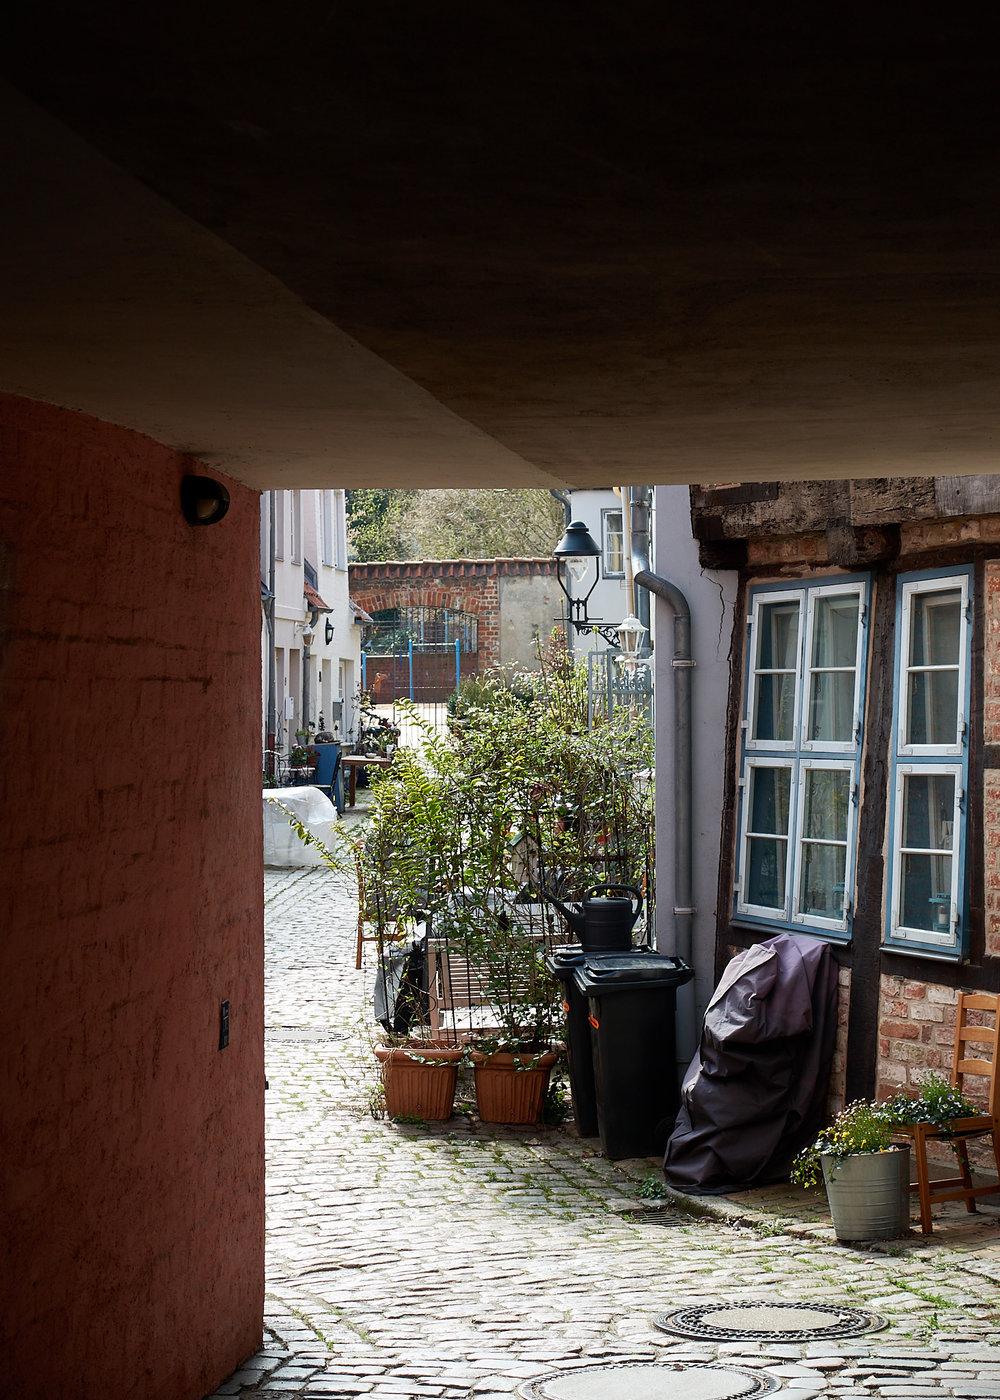 20190330-Lübeck-282.jpg